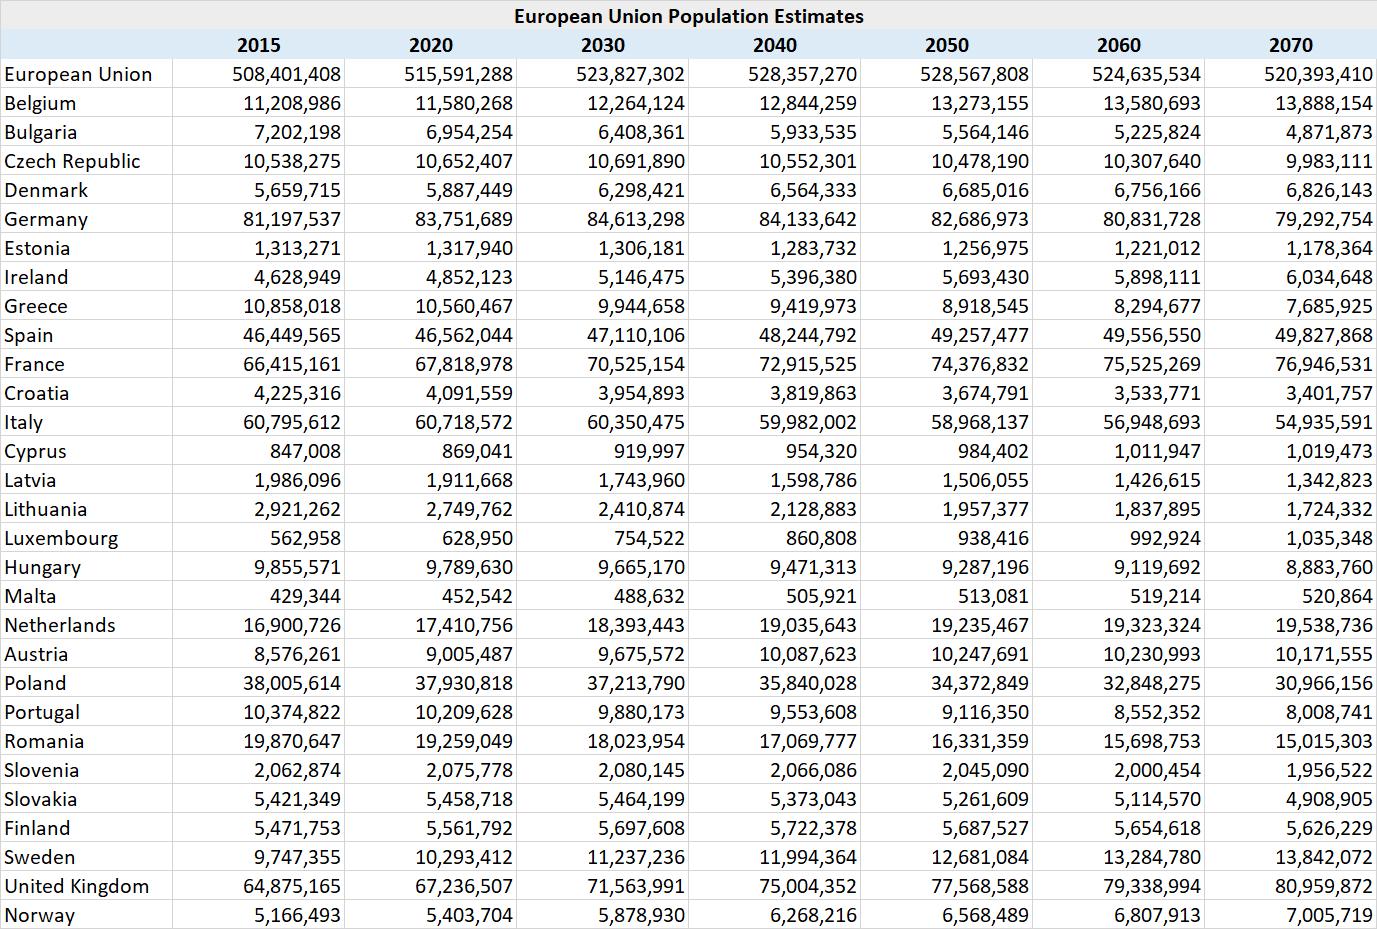 EU population growth estimates